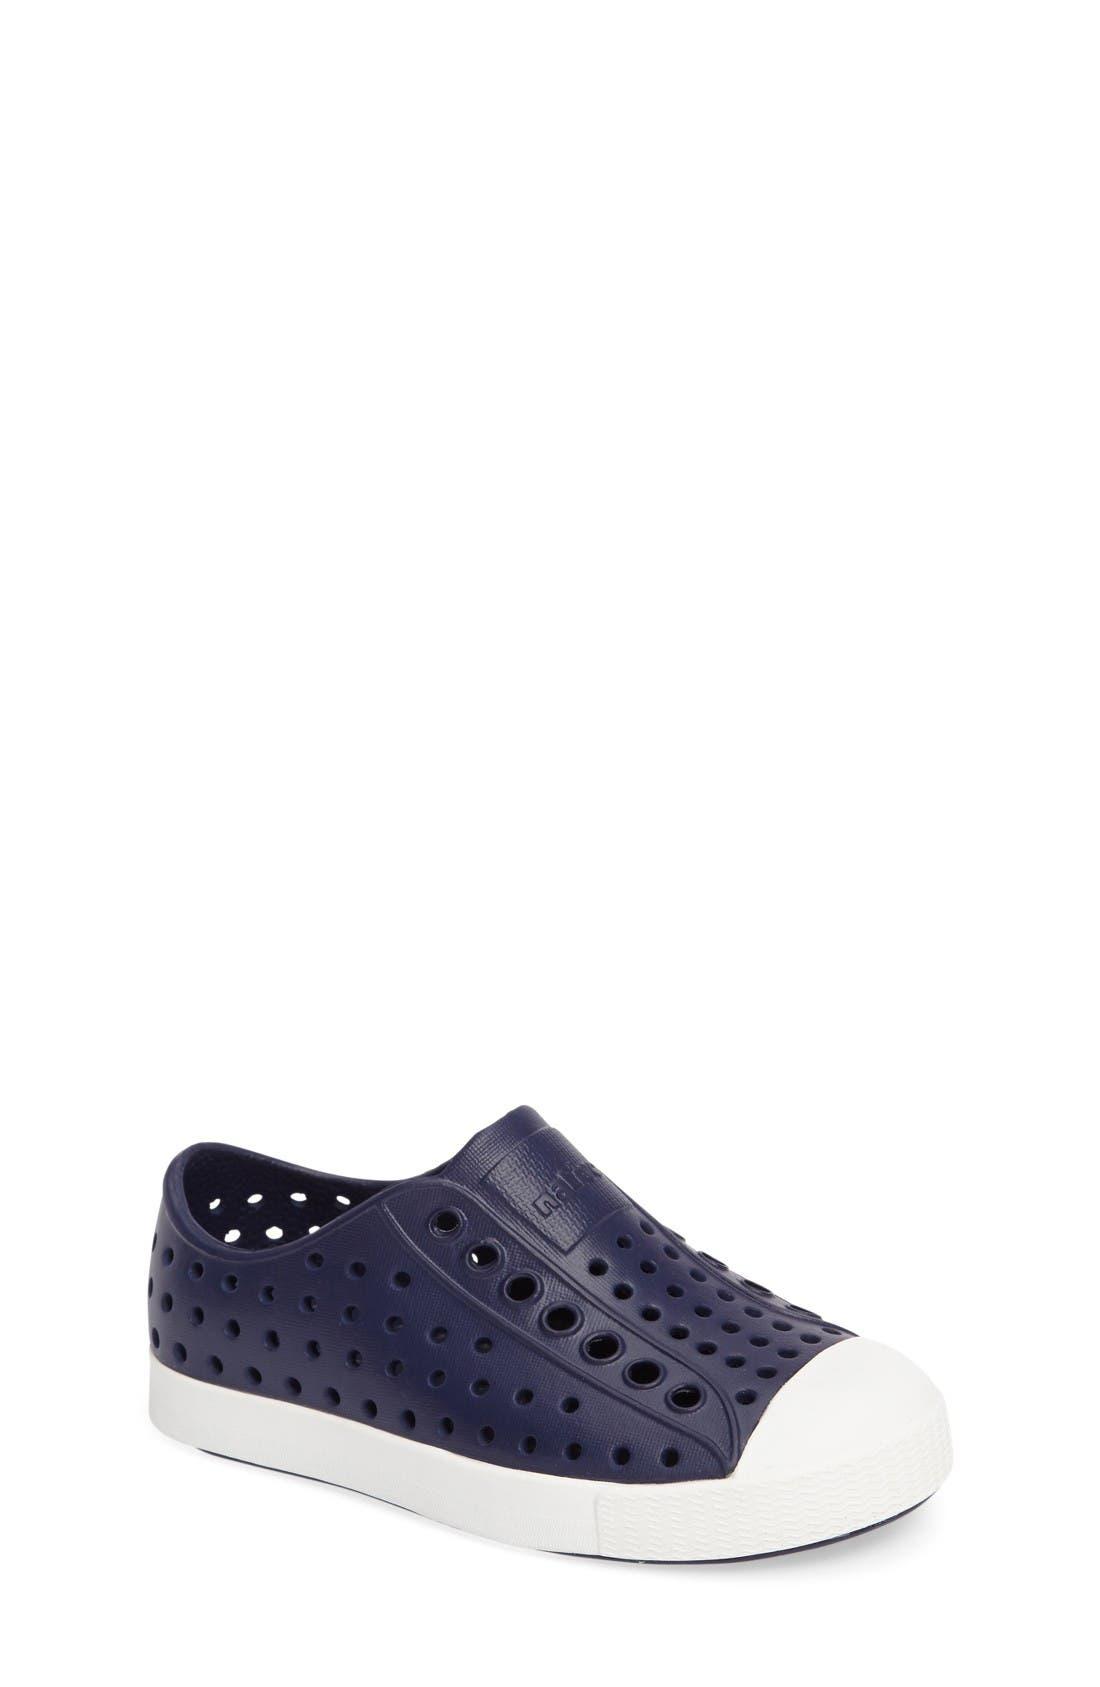 'Jefferson' Water Friendly Slip-On Sneaker,                             Main thumbnail 1, color,                             Regatta Blue/ Shell White